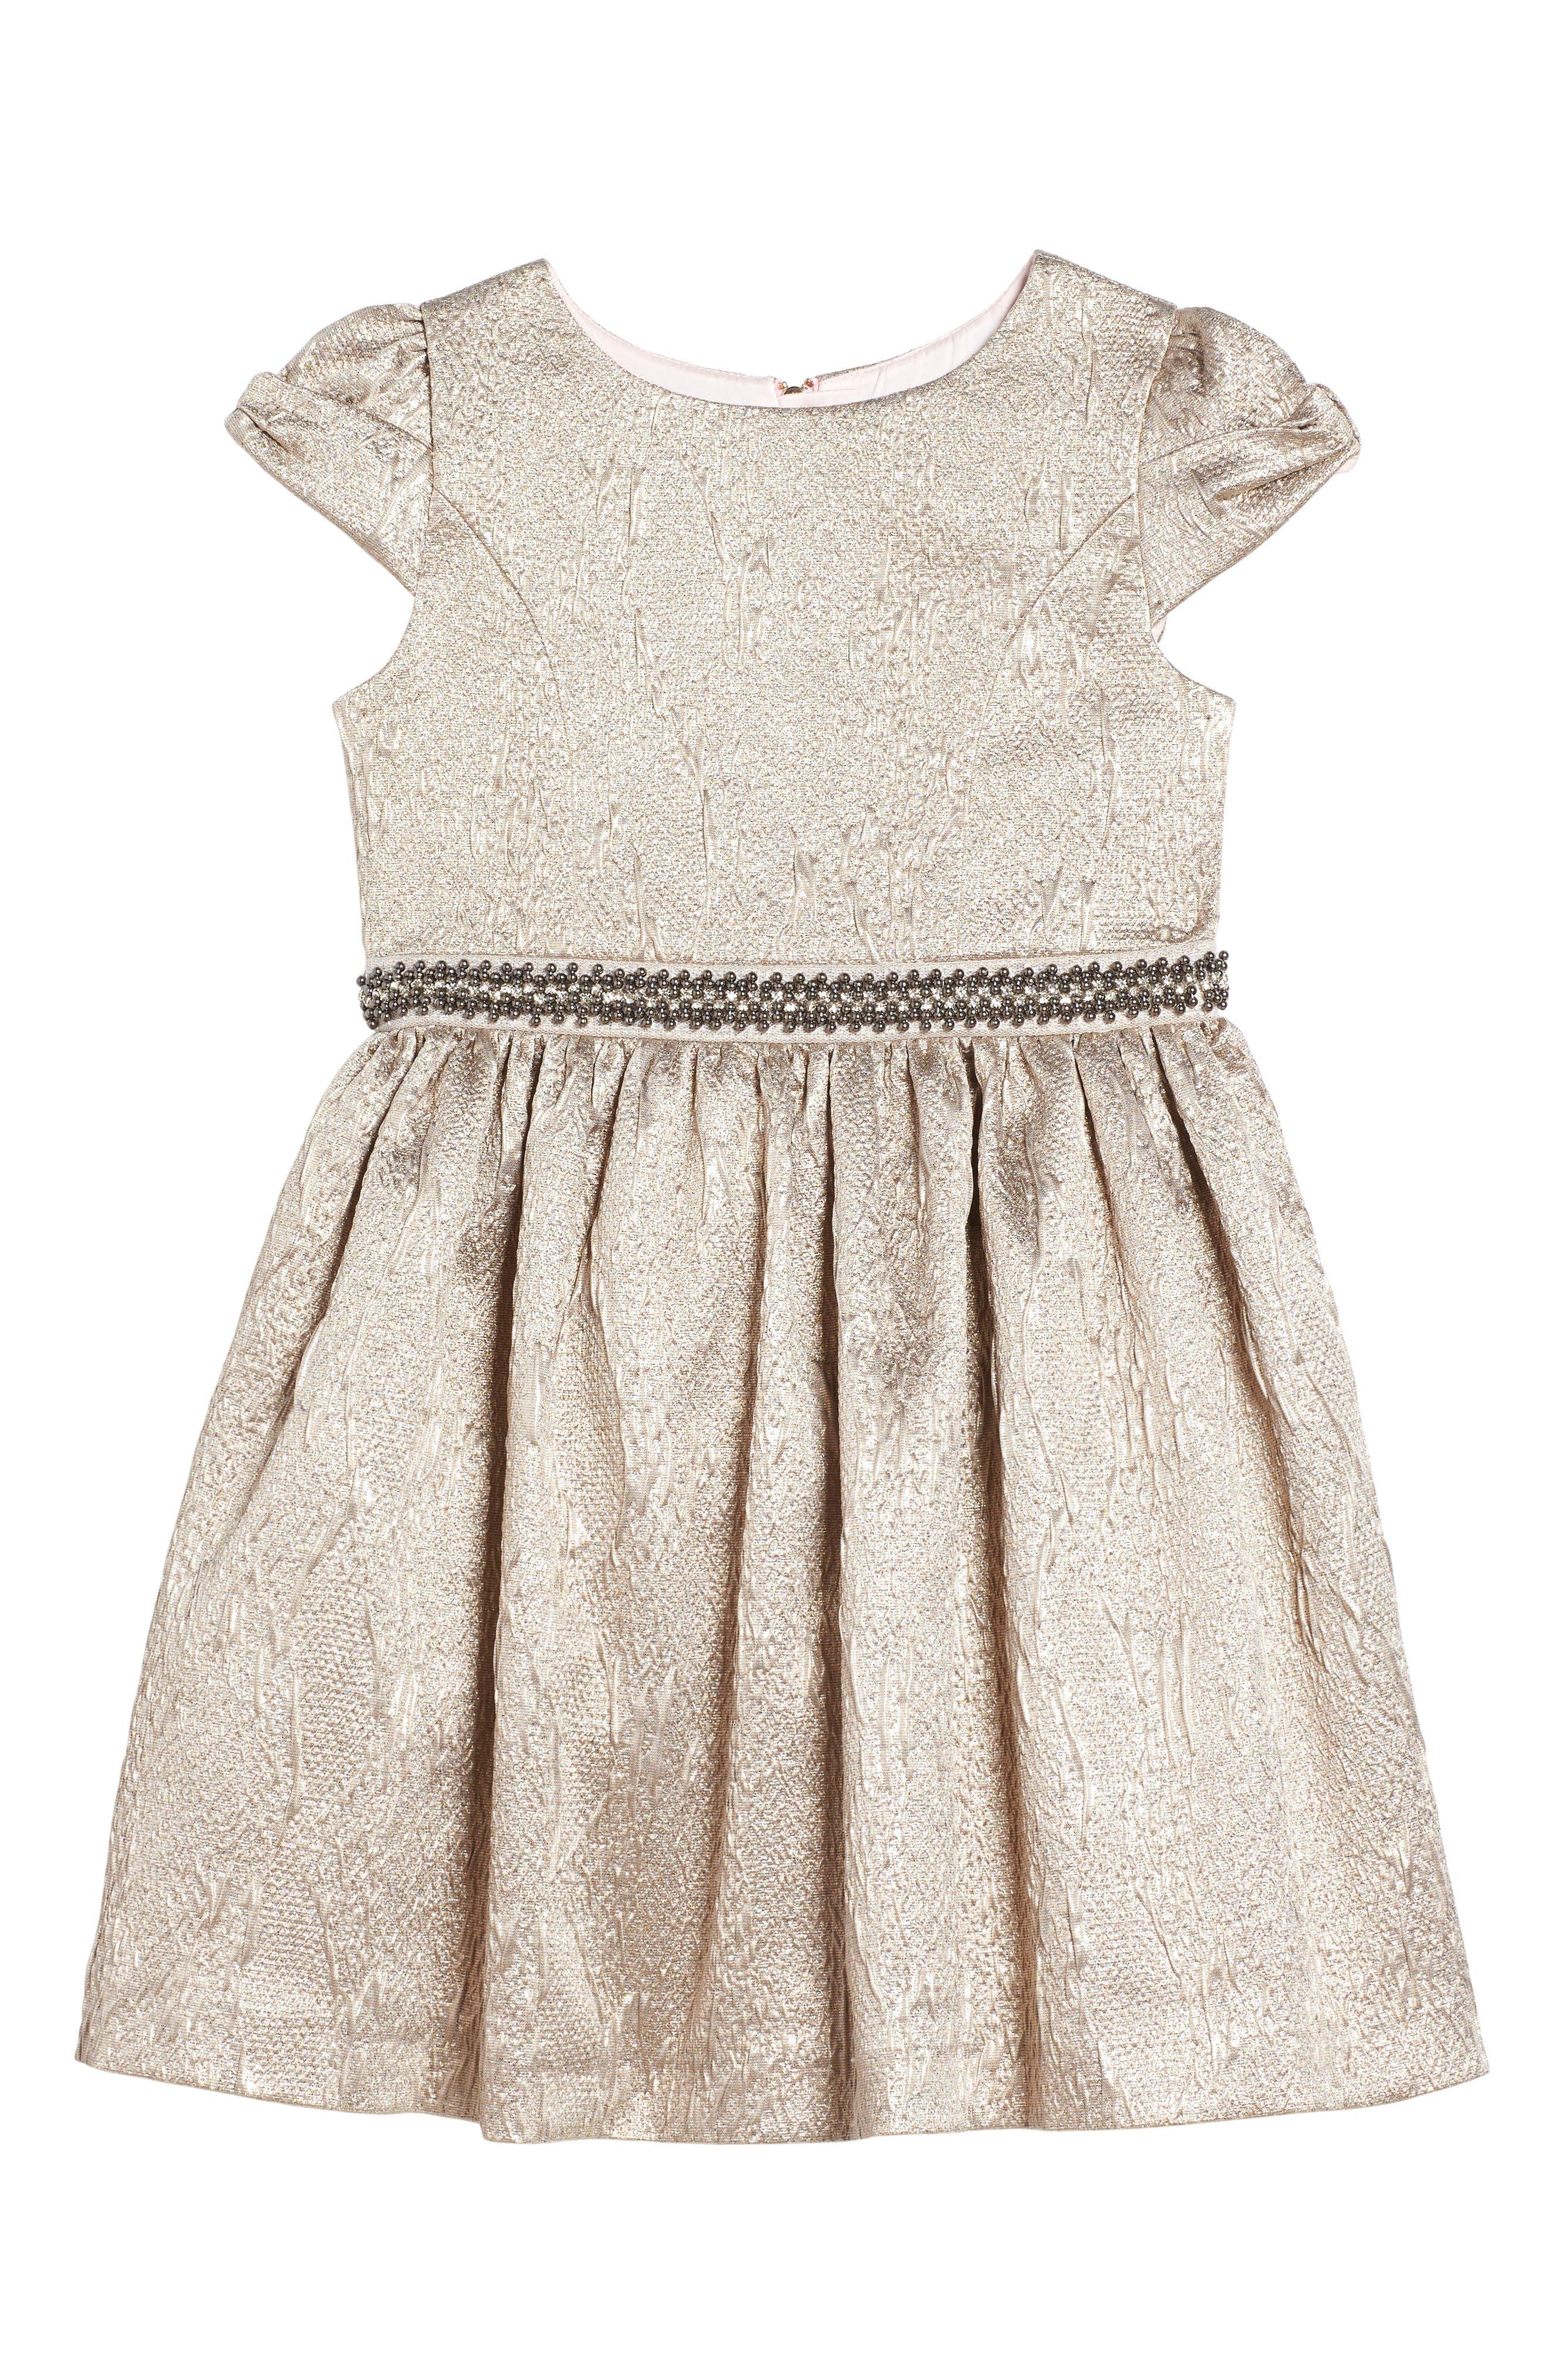 Main Image - Oh My Jacquard Party Dress (Little Girls & Big Girls)